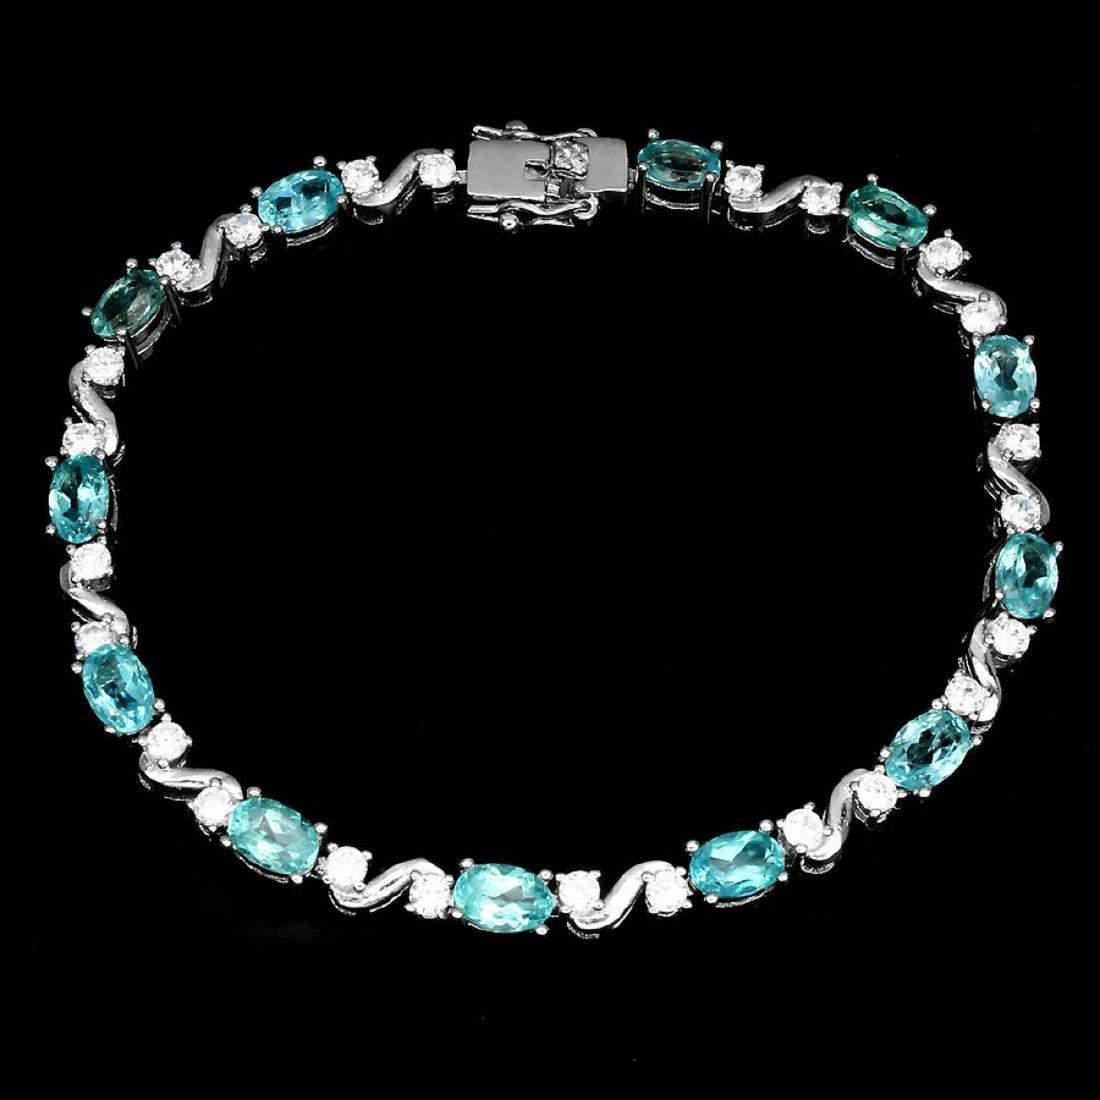 Natural Oval Neon Blue Apatite 60 Carats Bracelet - 2